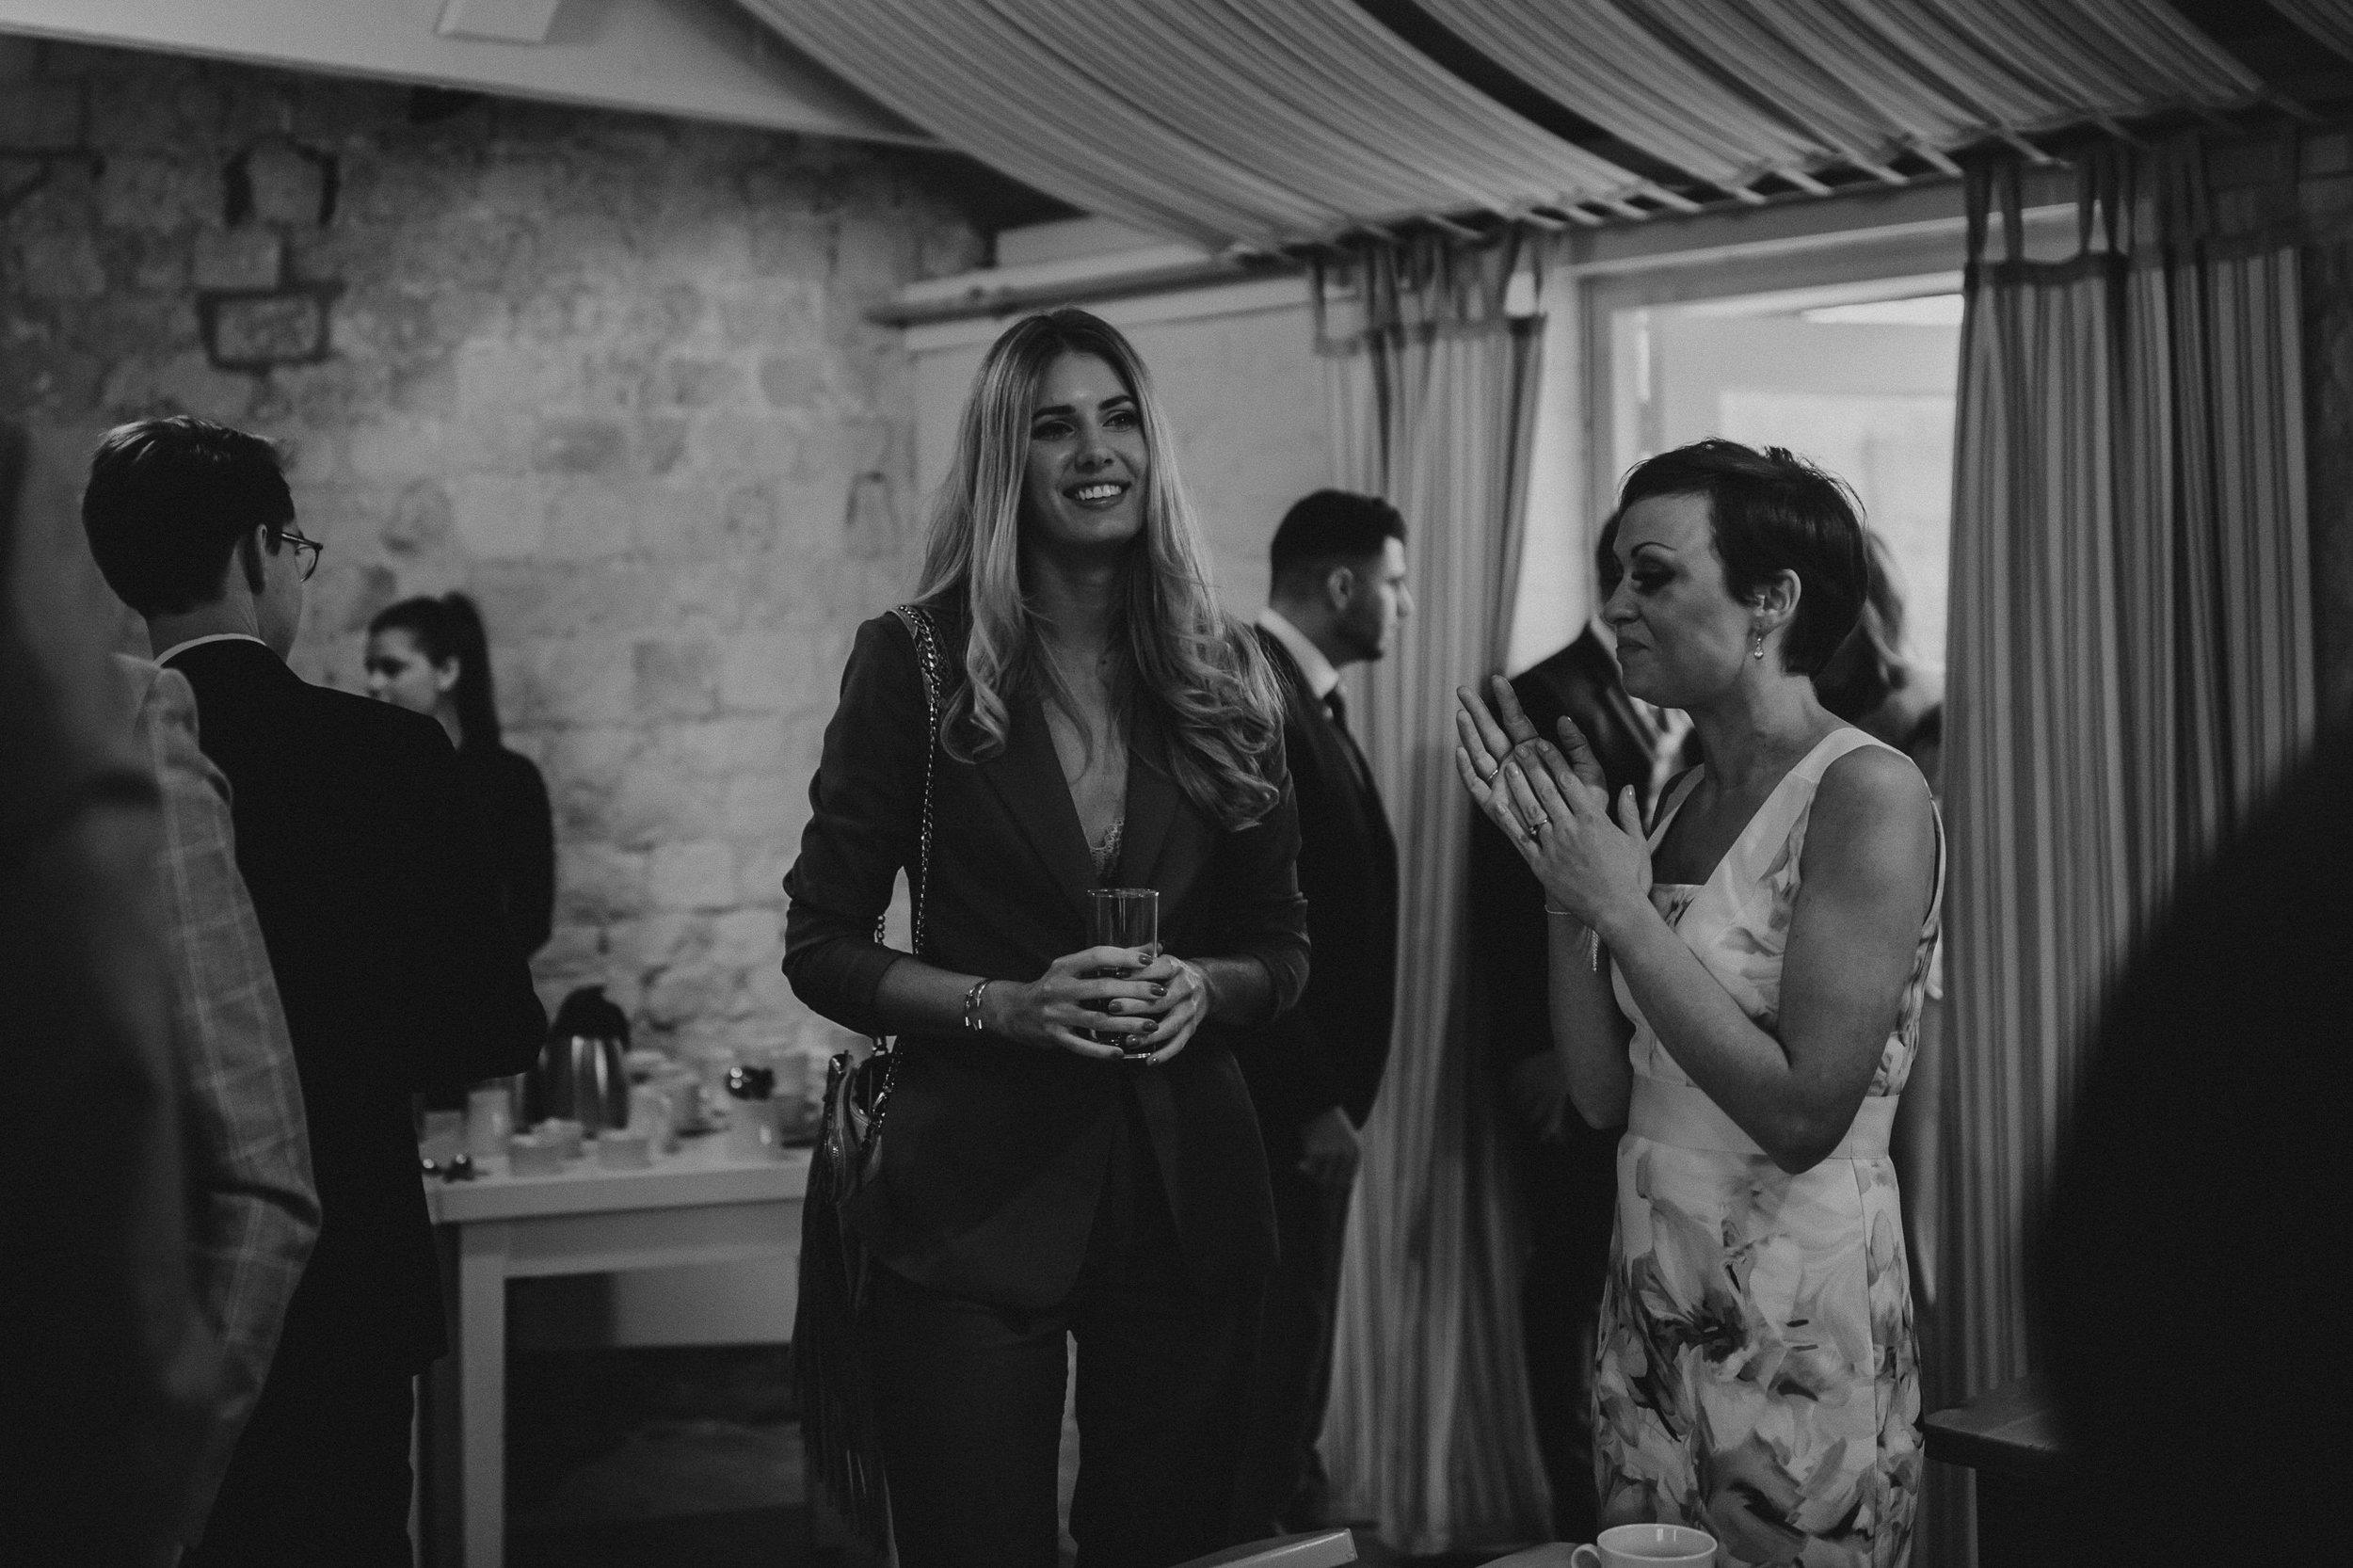 London_wedding_photographer_gione_da_silva_carelle_paul75.jpg